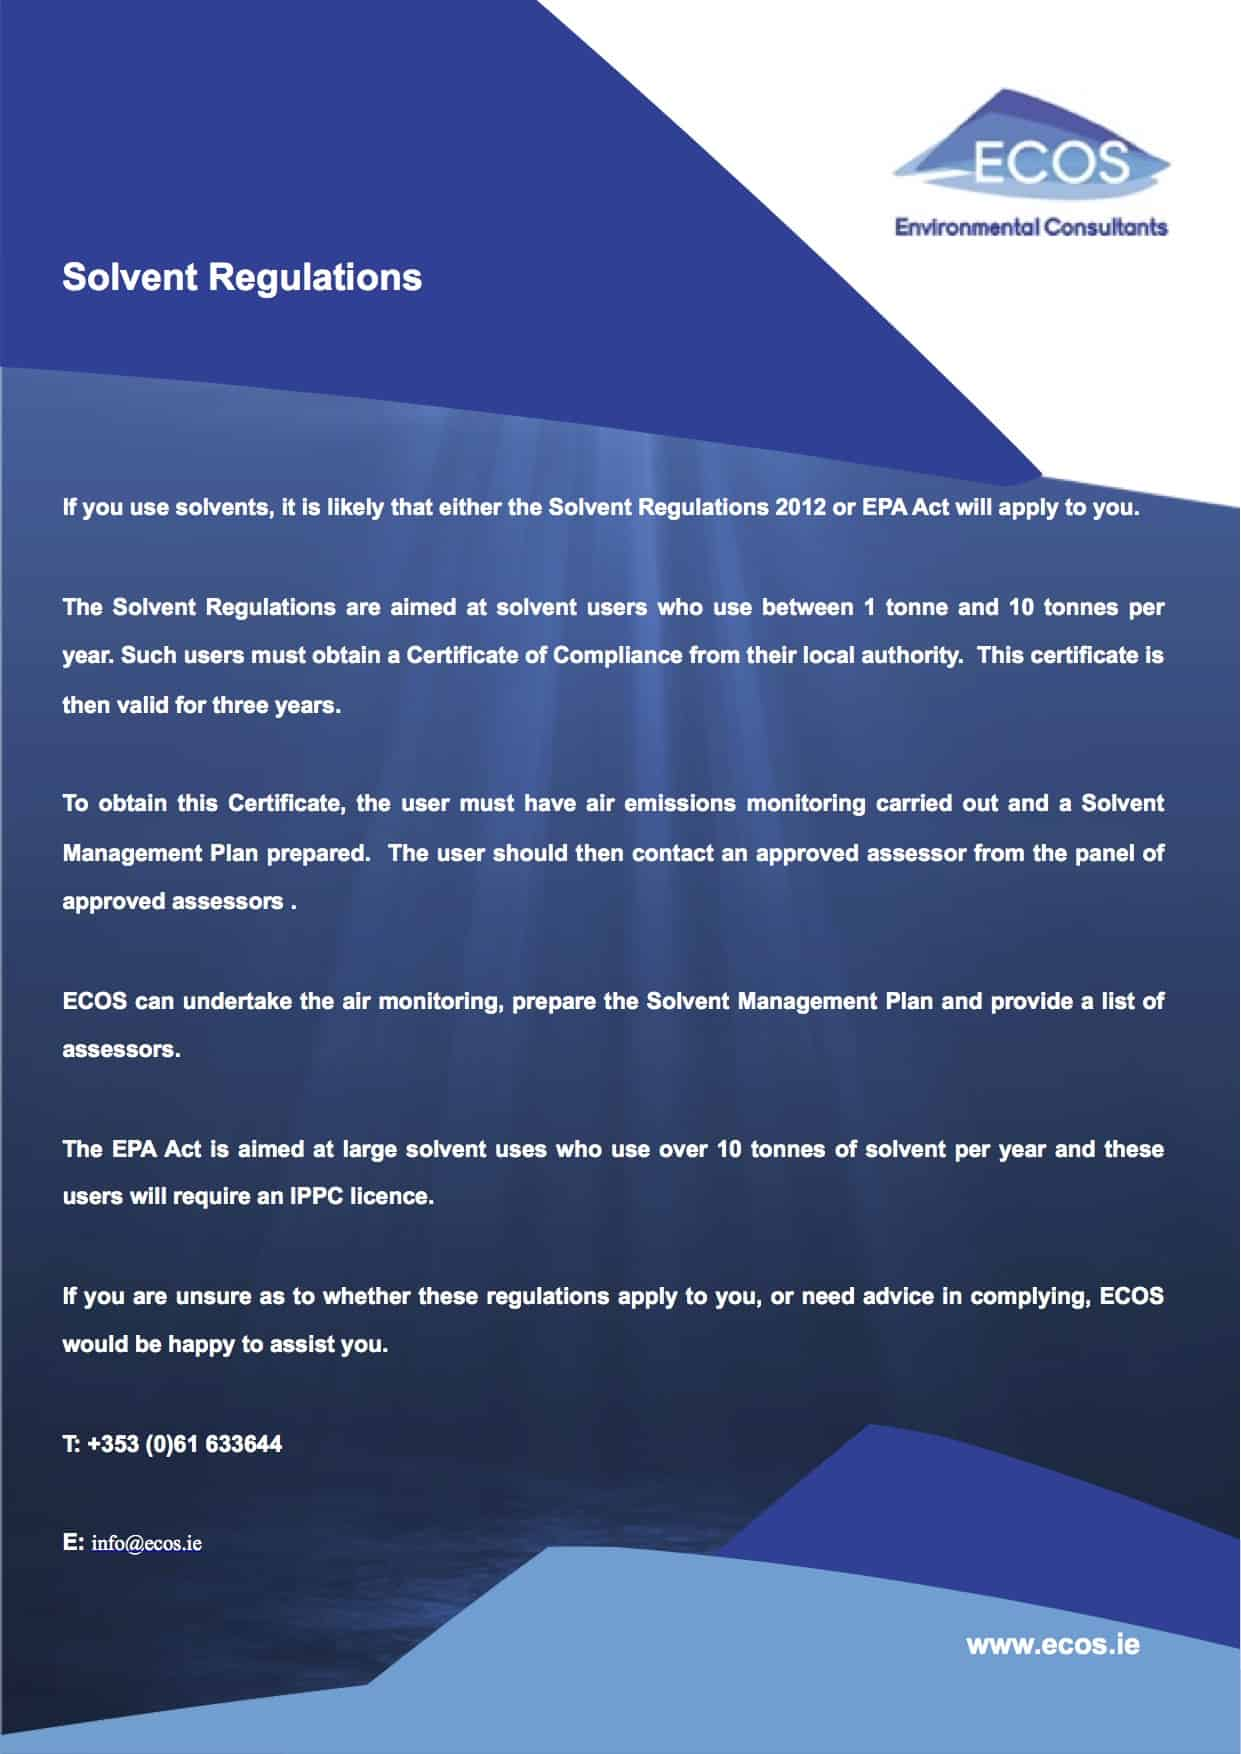 Solvent Regulations